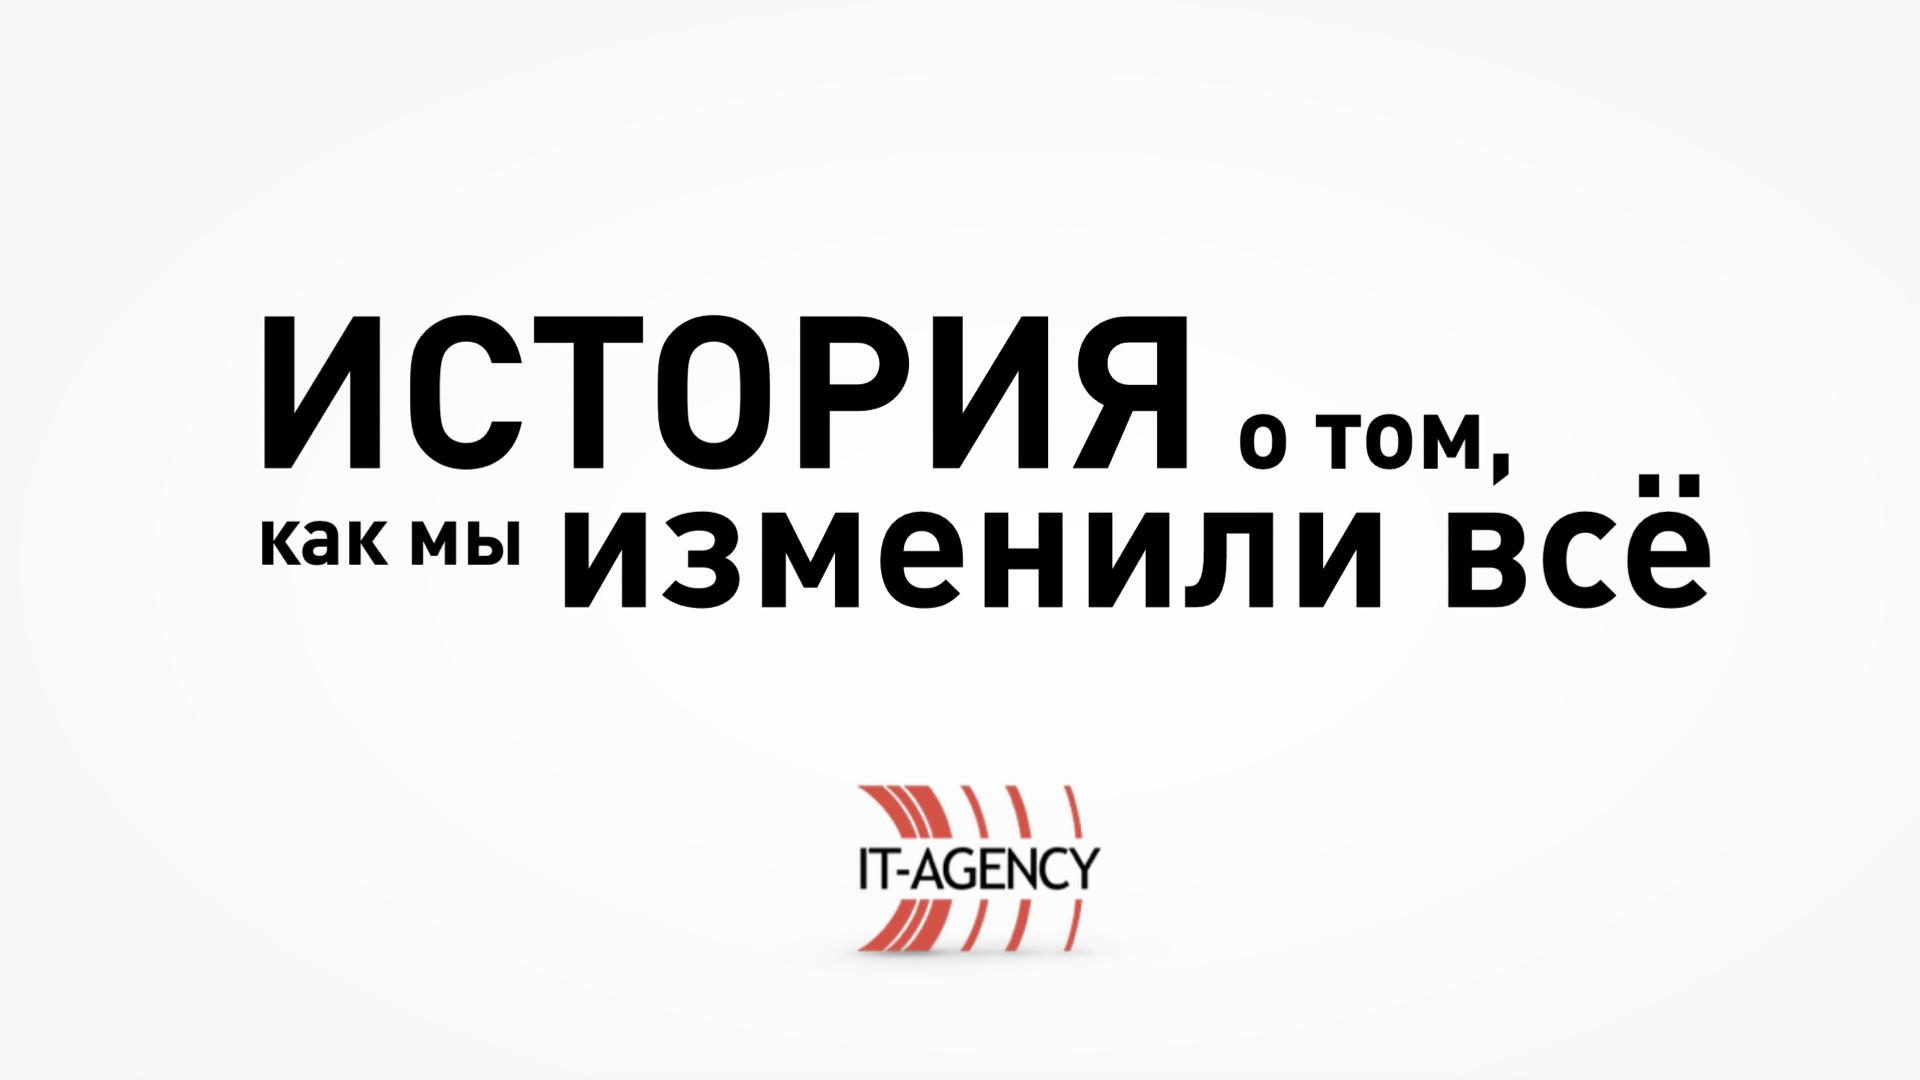 Кейс «Презентация-диафильм о компании IT-Agency»